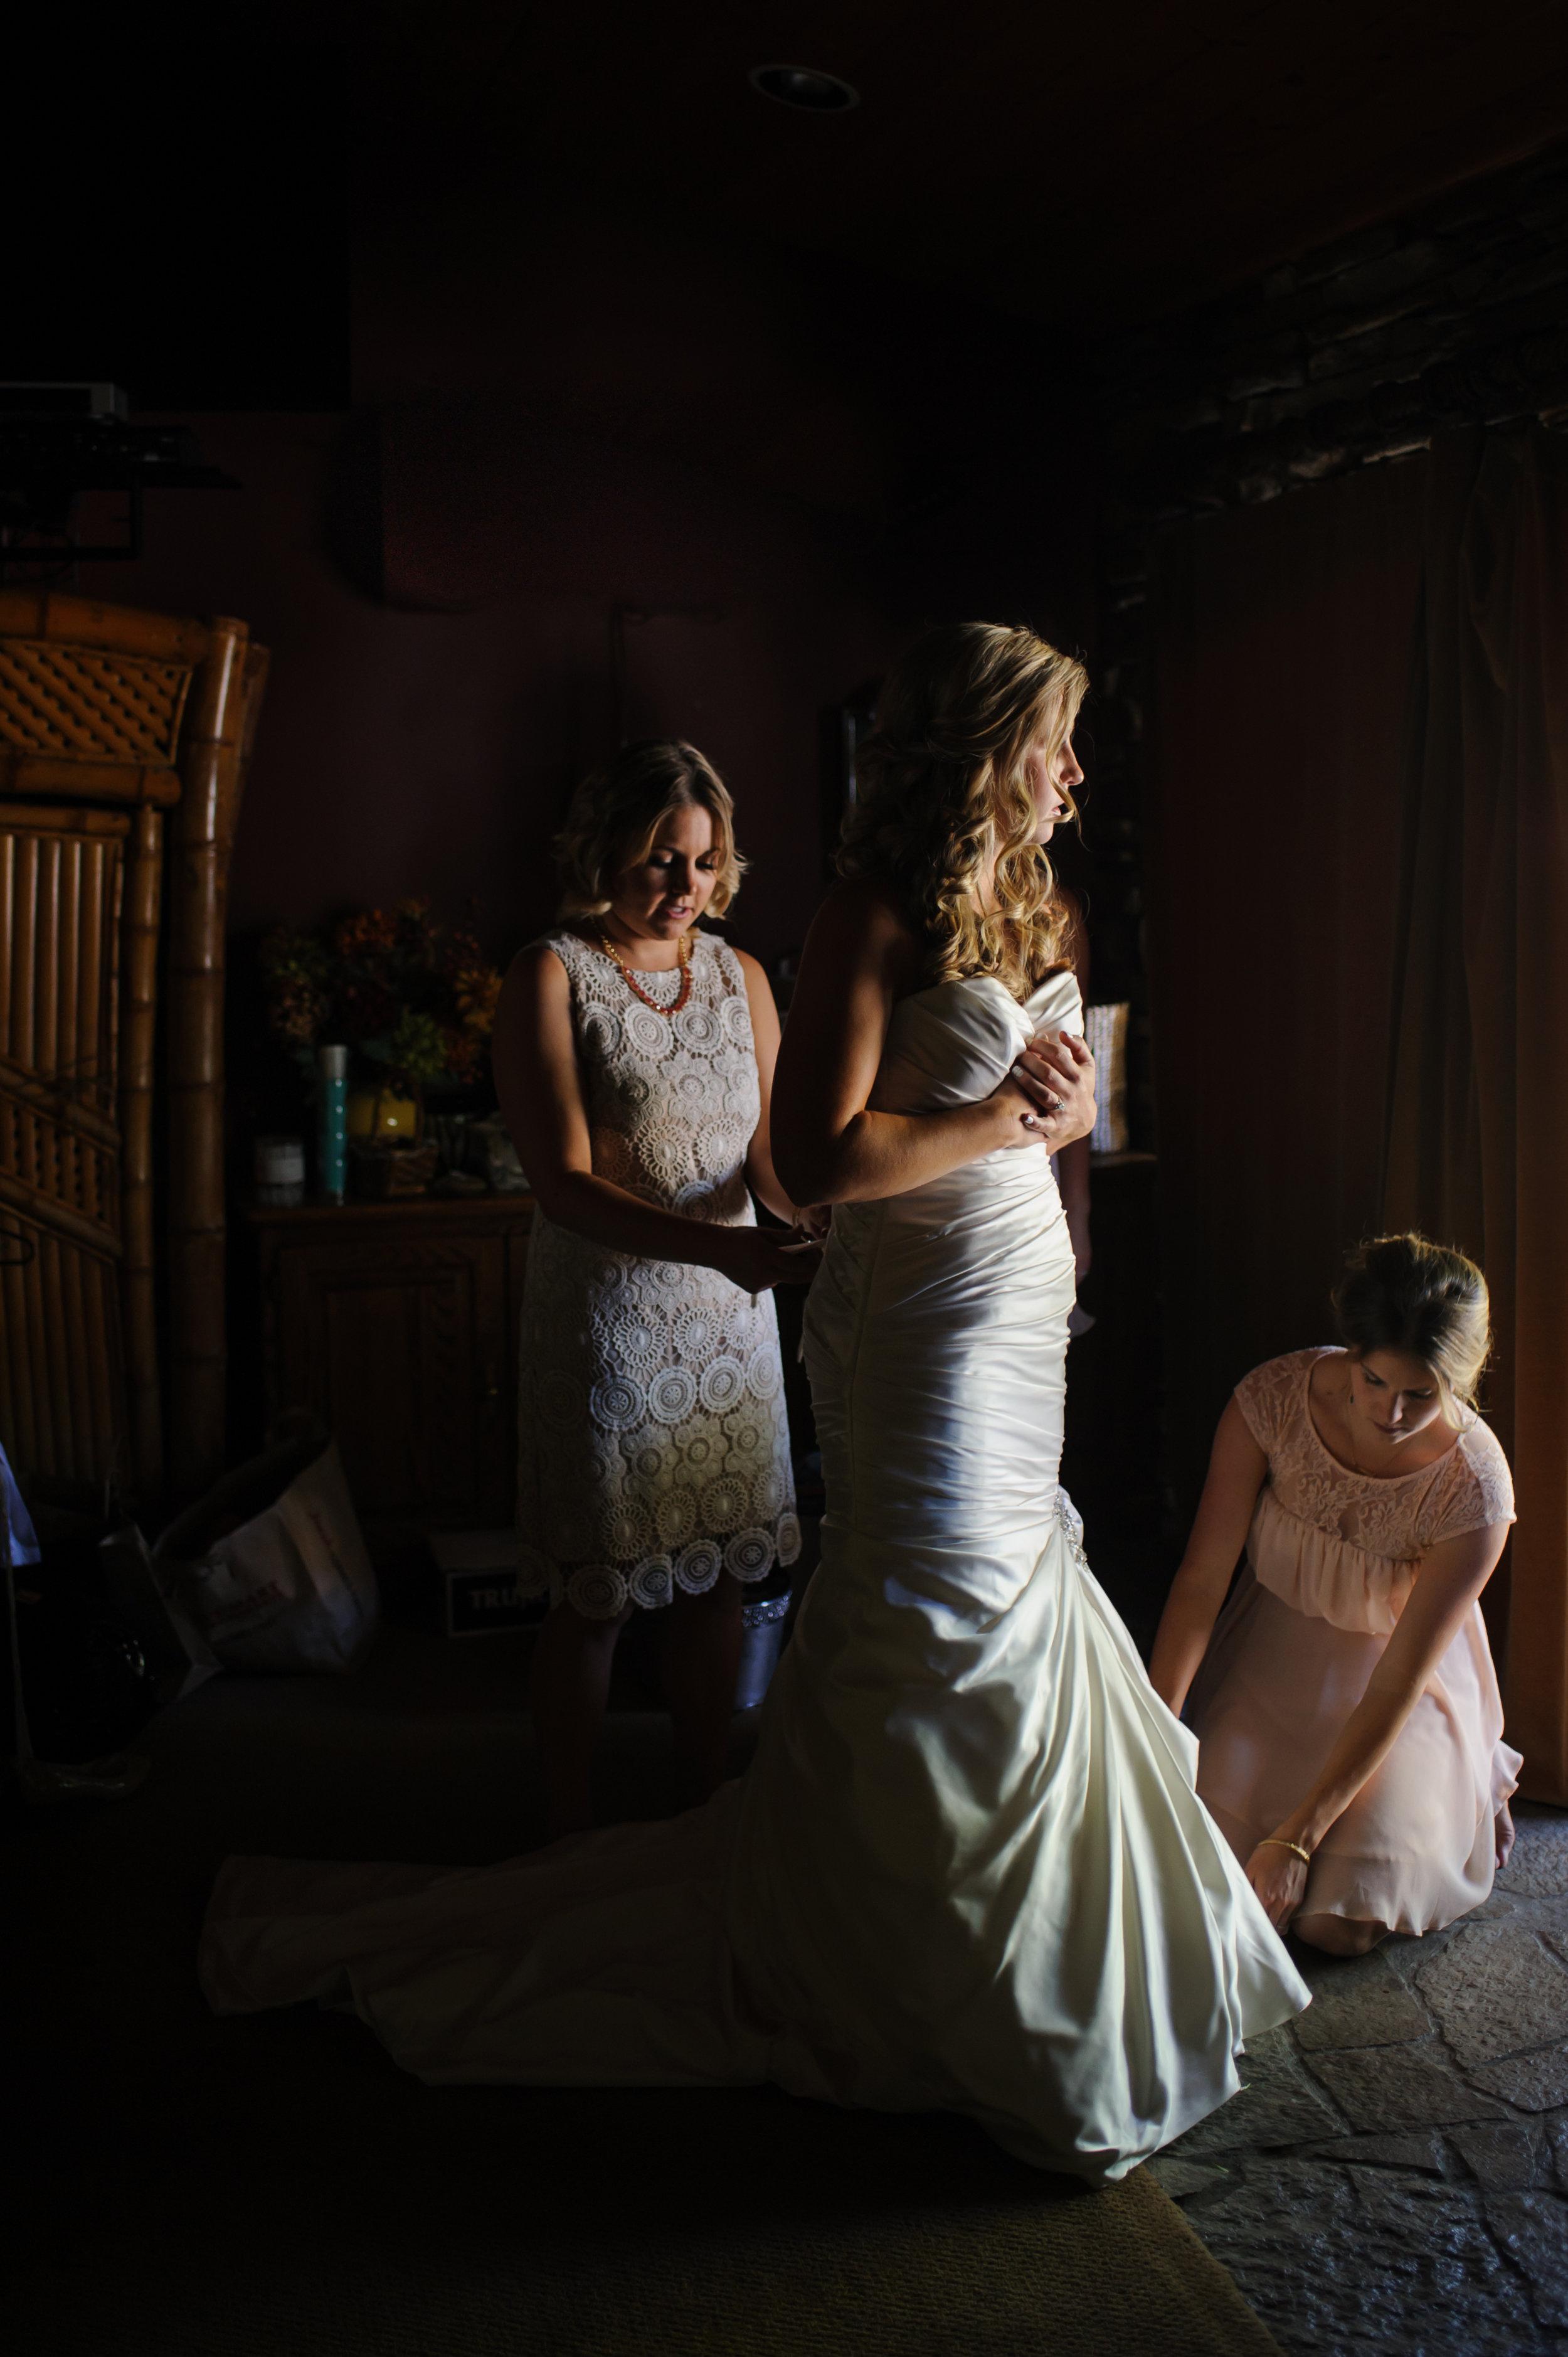 lindsey-alex-009-backyard-sacramento-wedding-photographer-katherine-nicole-photography.JPG